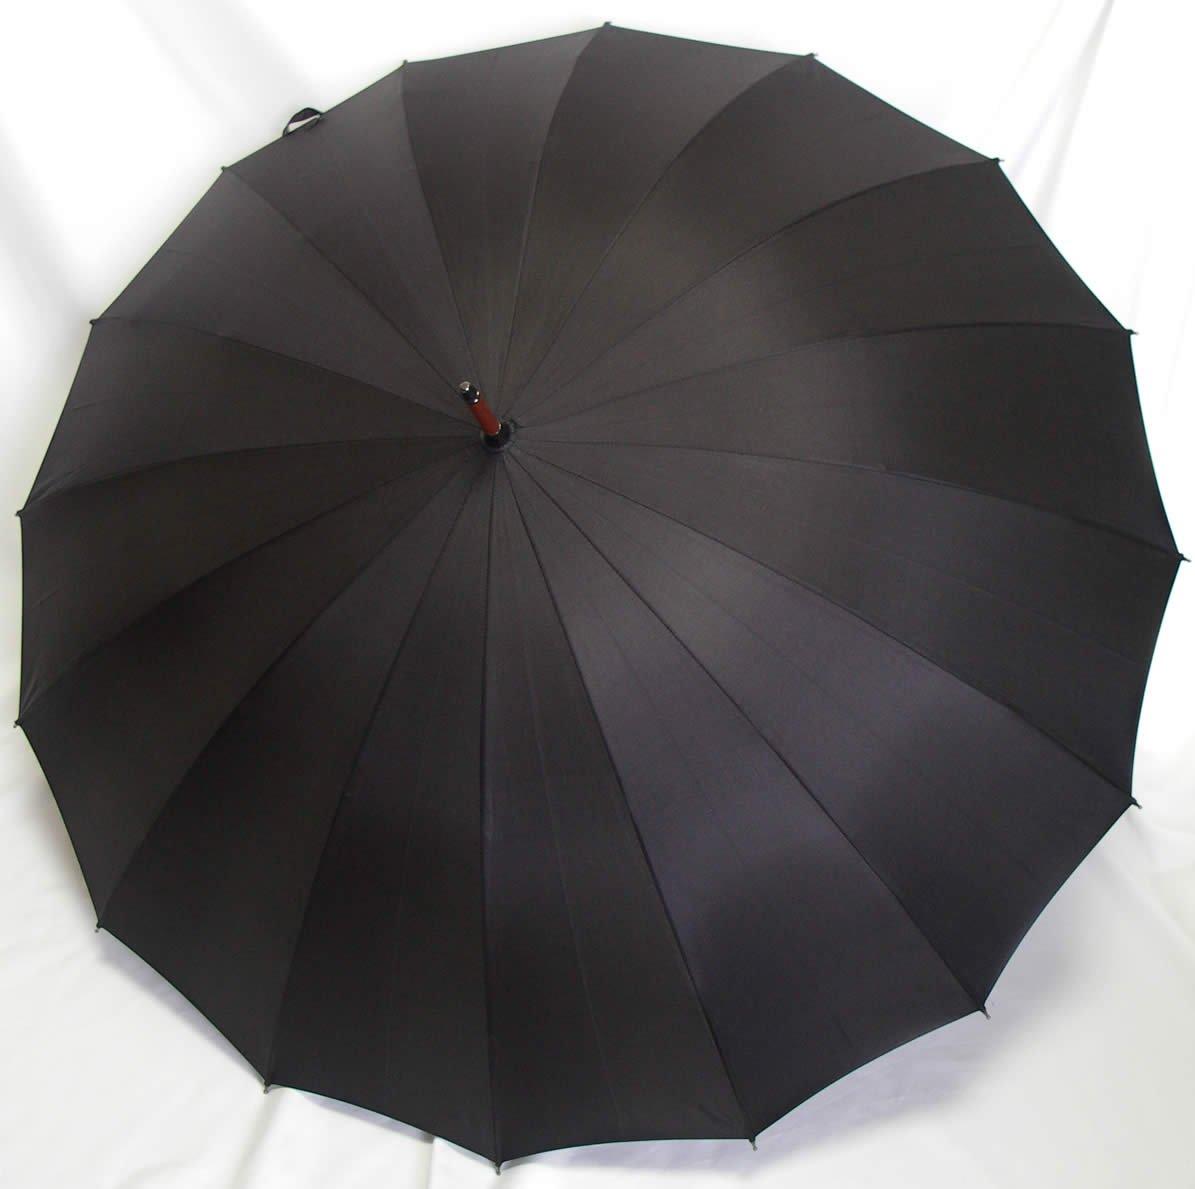 前原光栄商店 前原傘 紳士用 ブラック 焼籐 B00A2EUY3W